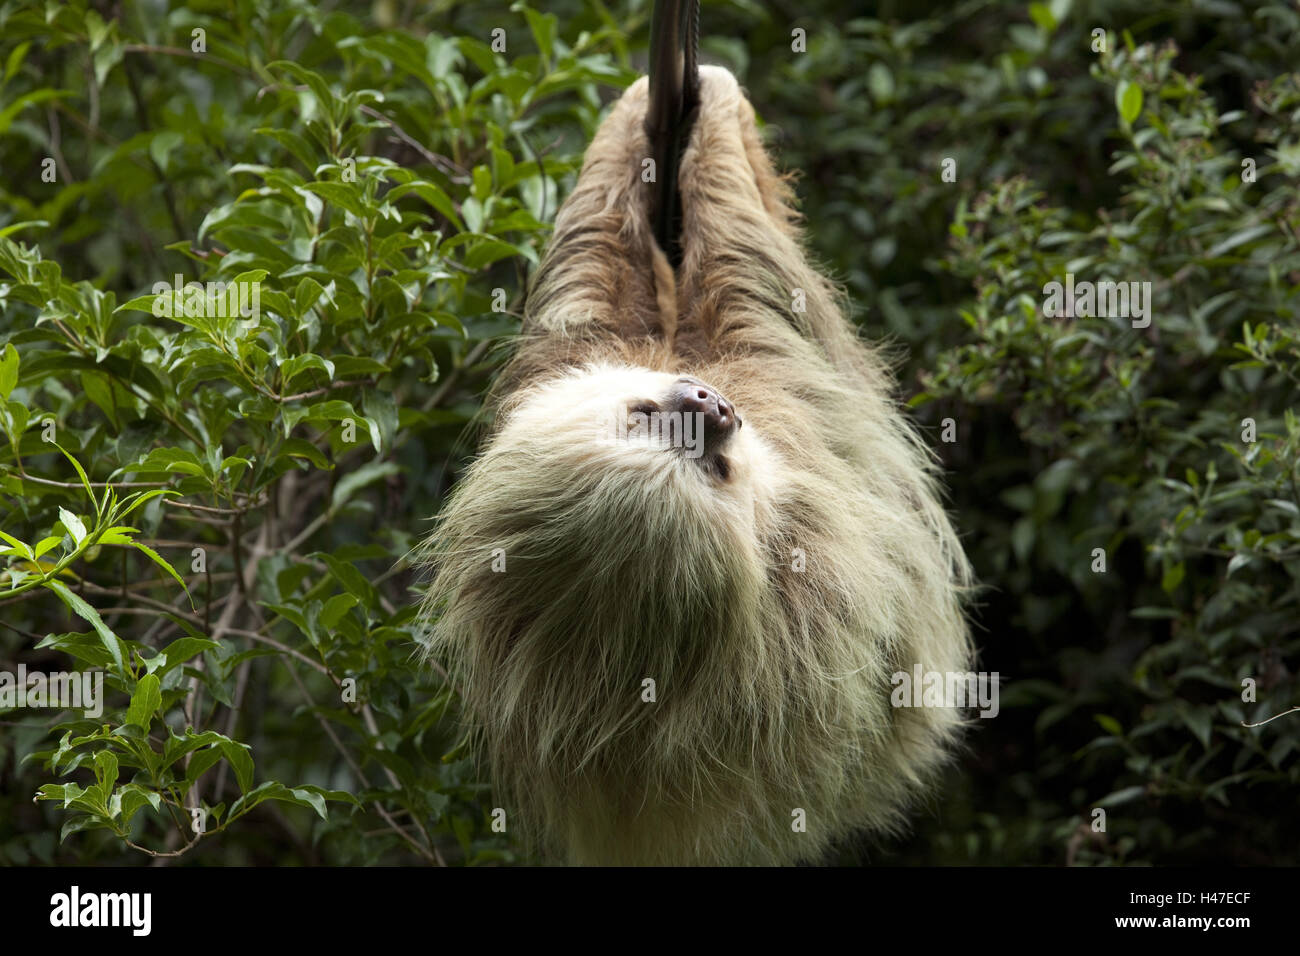 Sloth, province Alajuela, Costa Rica, waterfall gardens, Cascada La Paz, - Stock Image